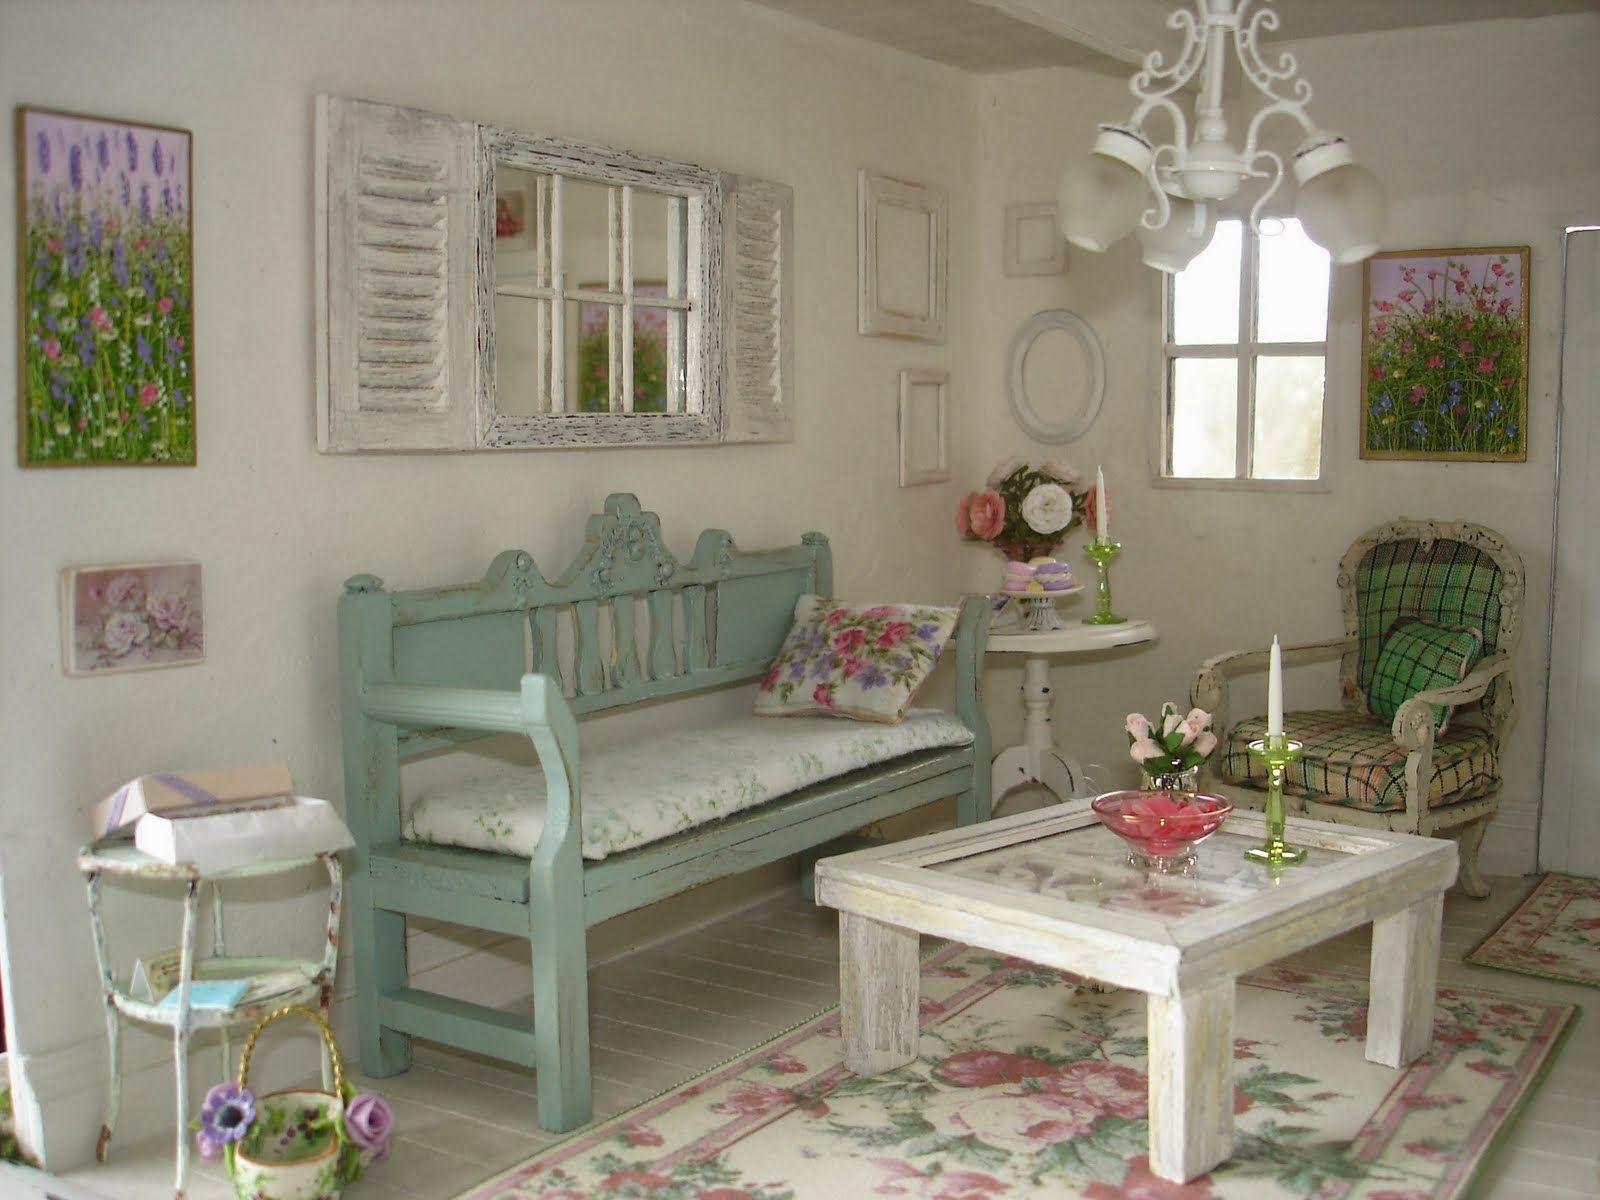 25 Shabby Chic Interior Design Ideas Shabby Chic Decor Living